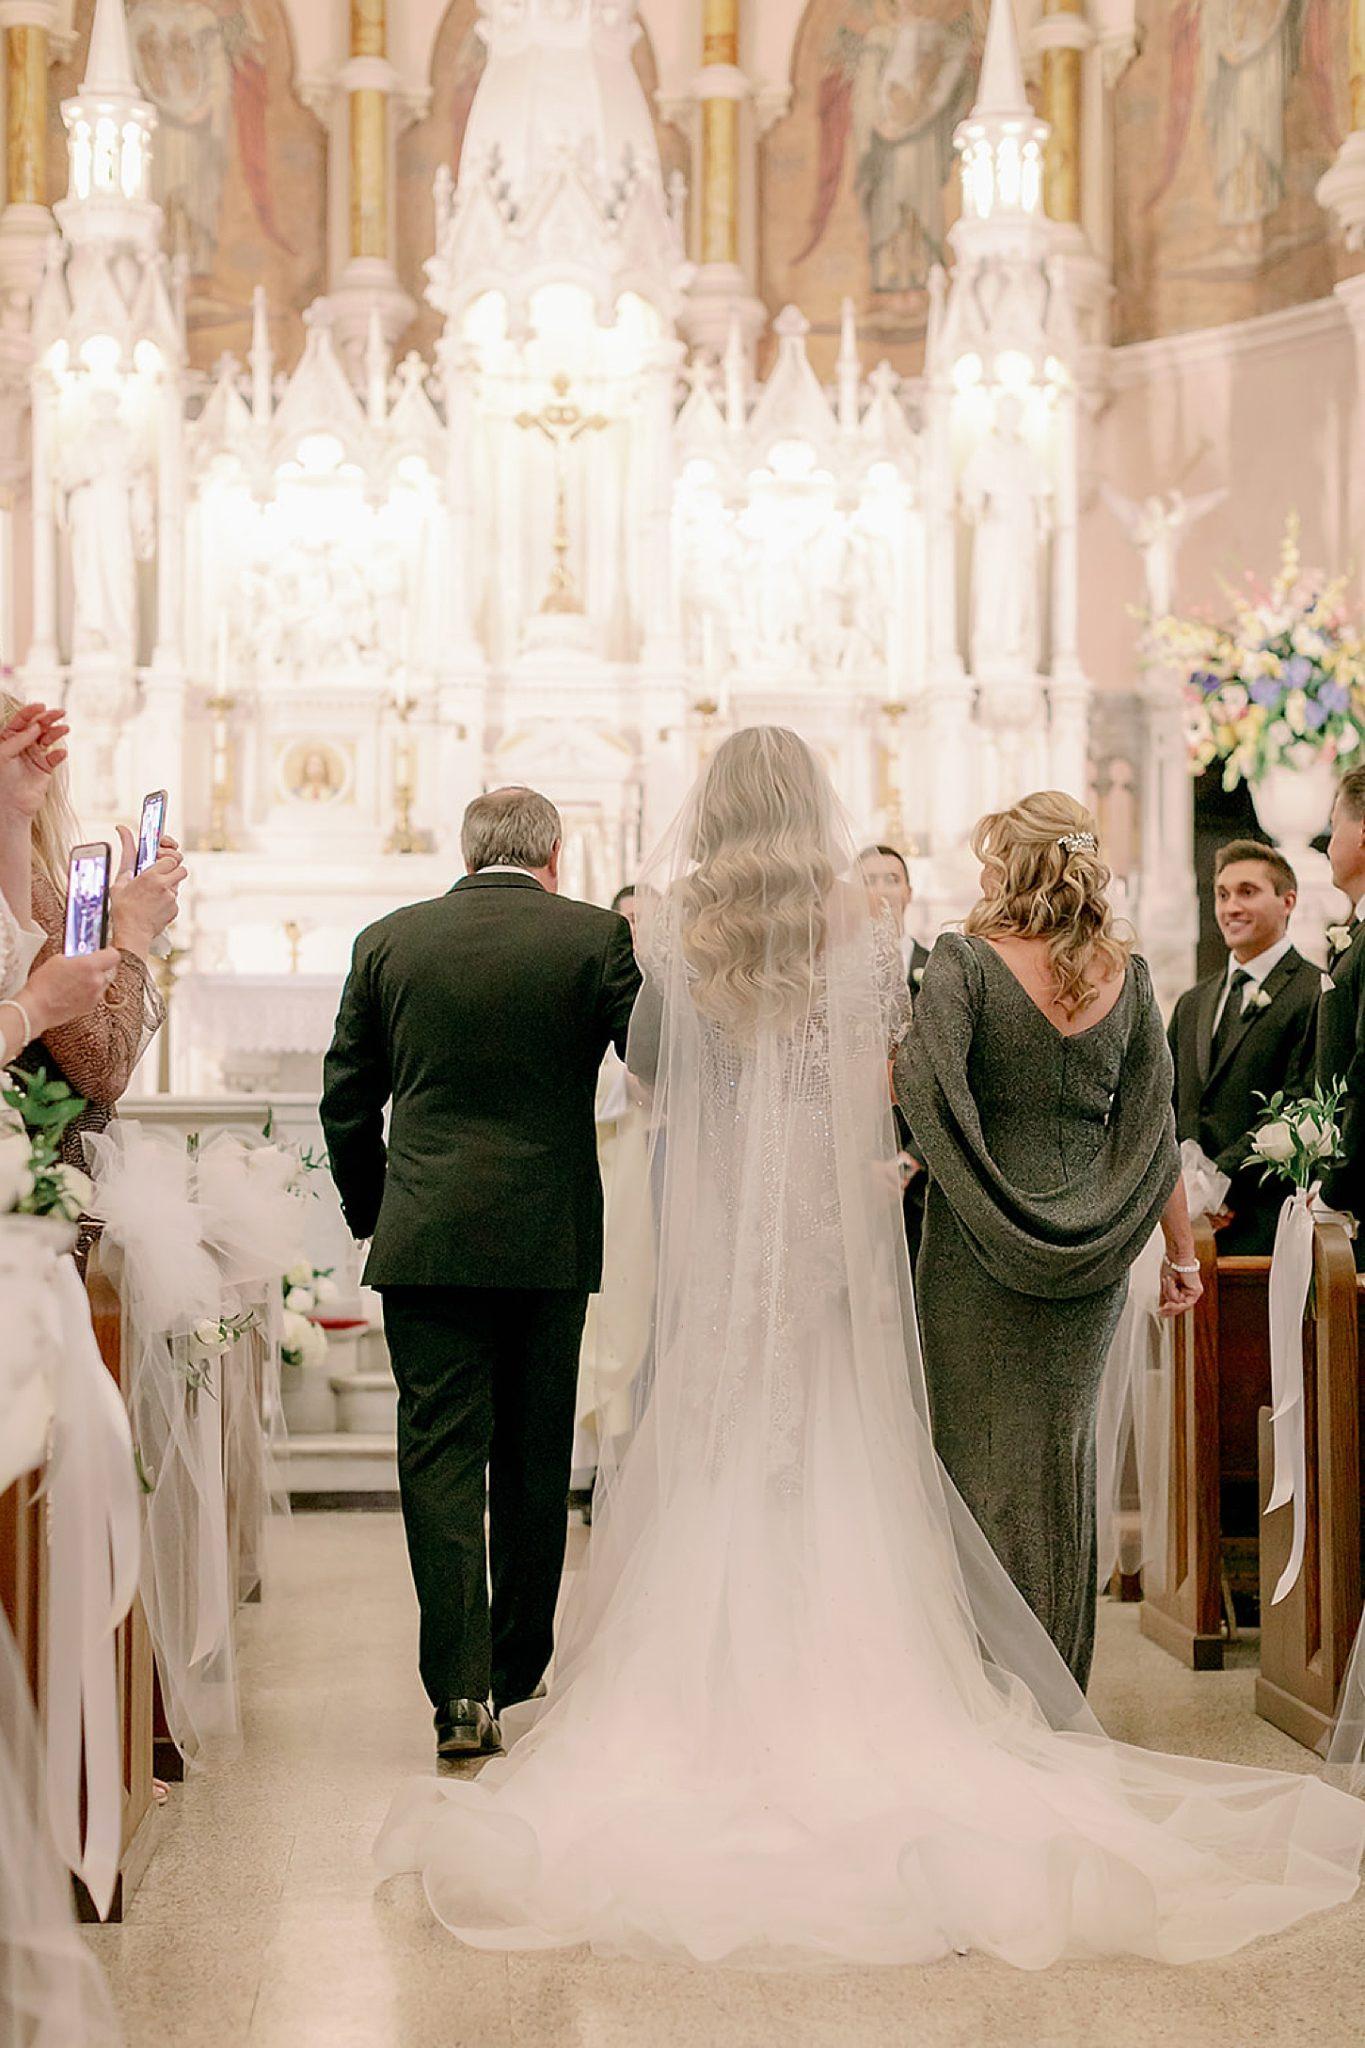 Atlantic City Wedding Photography Studio by Magdalena Studios Lexy Cha 0021 scaled